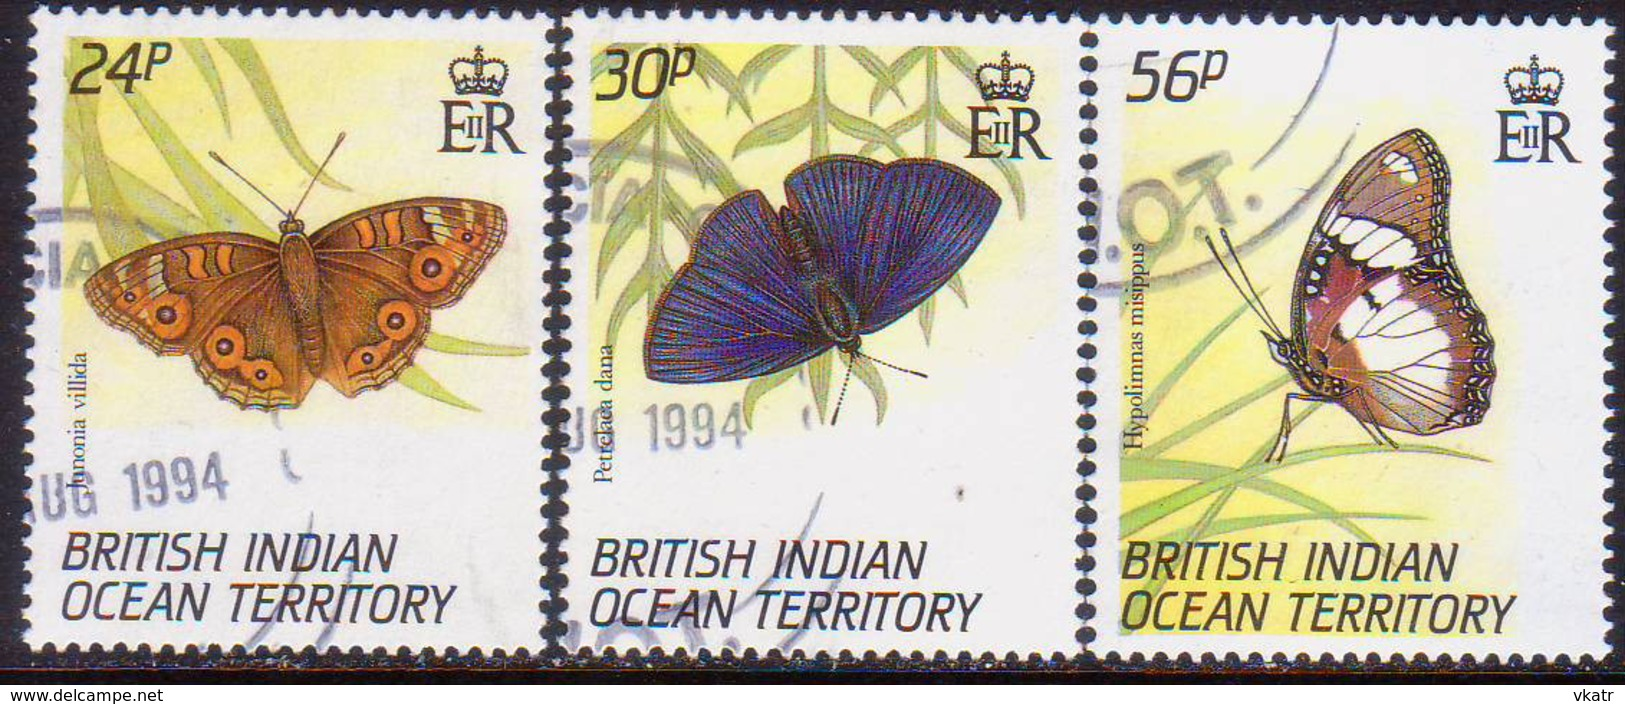 British Indian Ocean Territory 1994 SG 152-54 Compl.set Used Butterflies - British Indian Ocean Territory (BIOT)